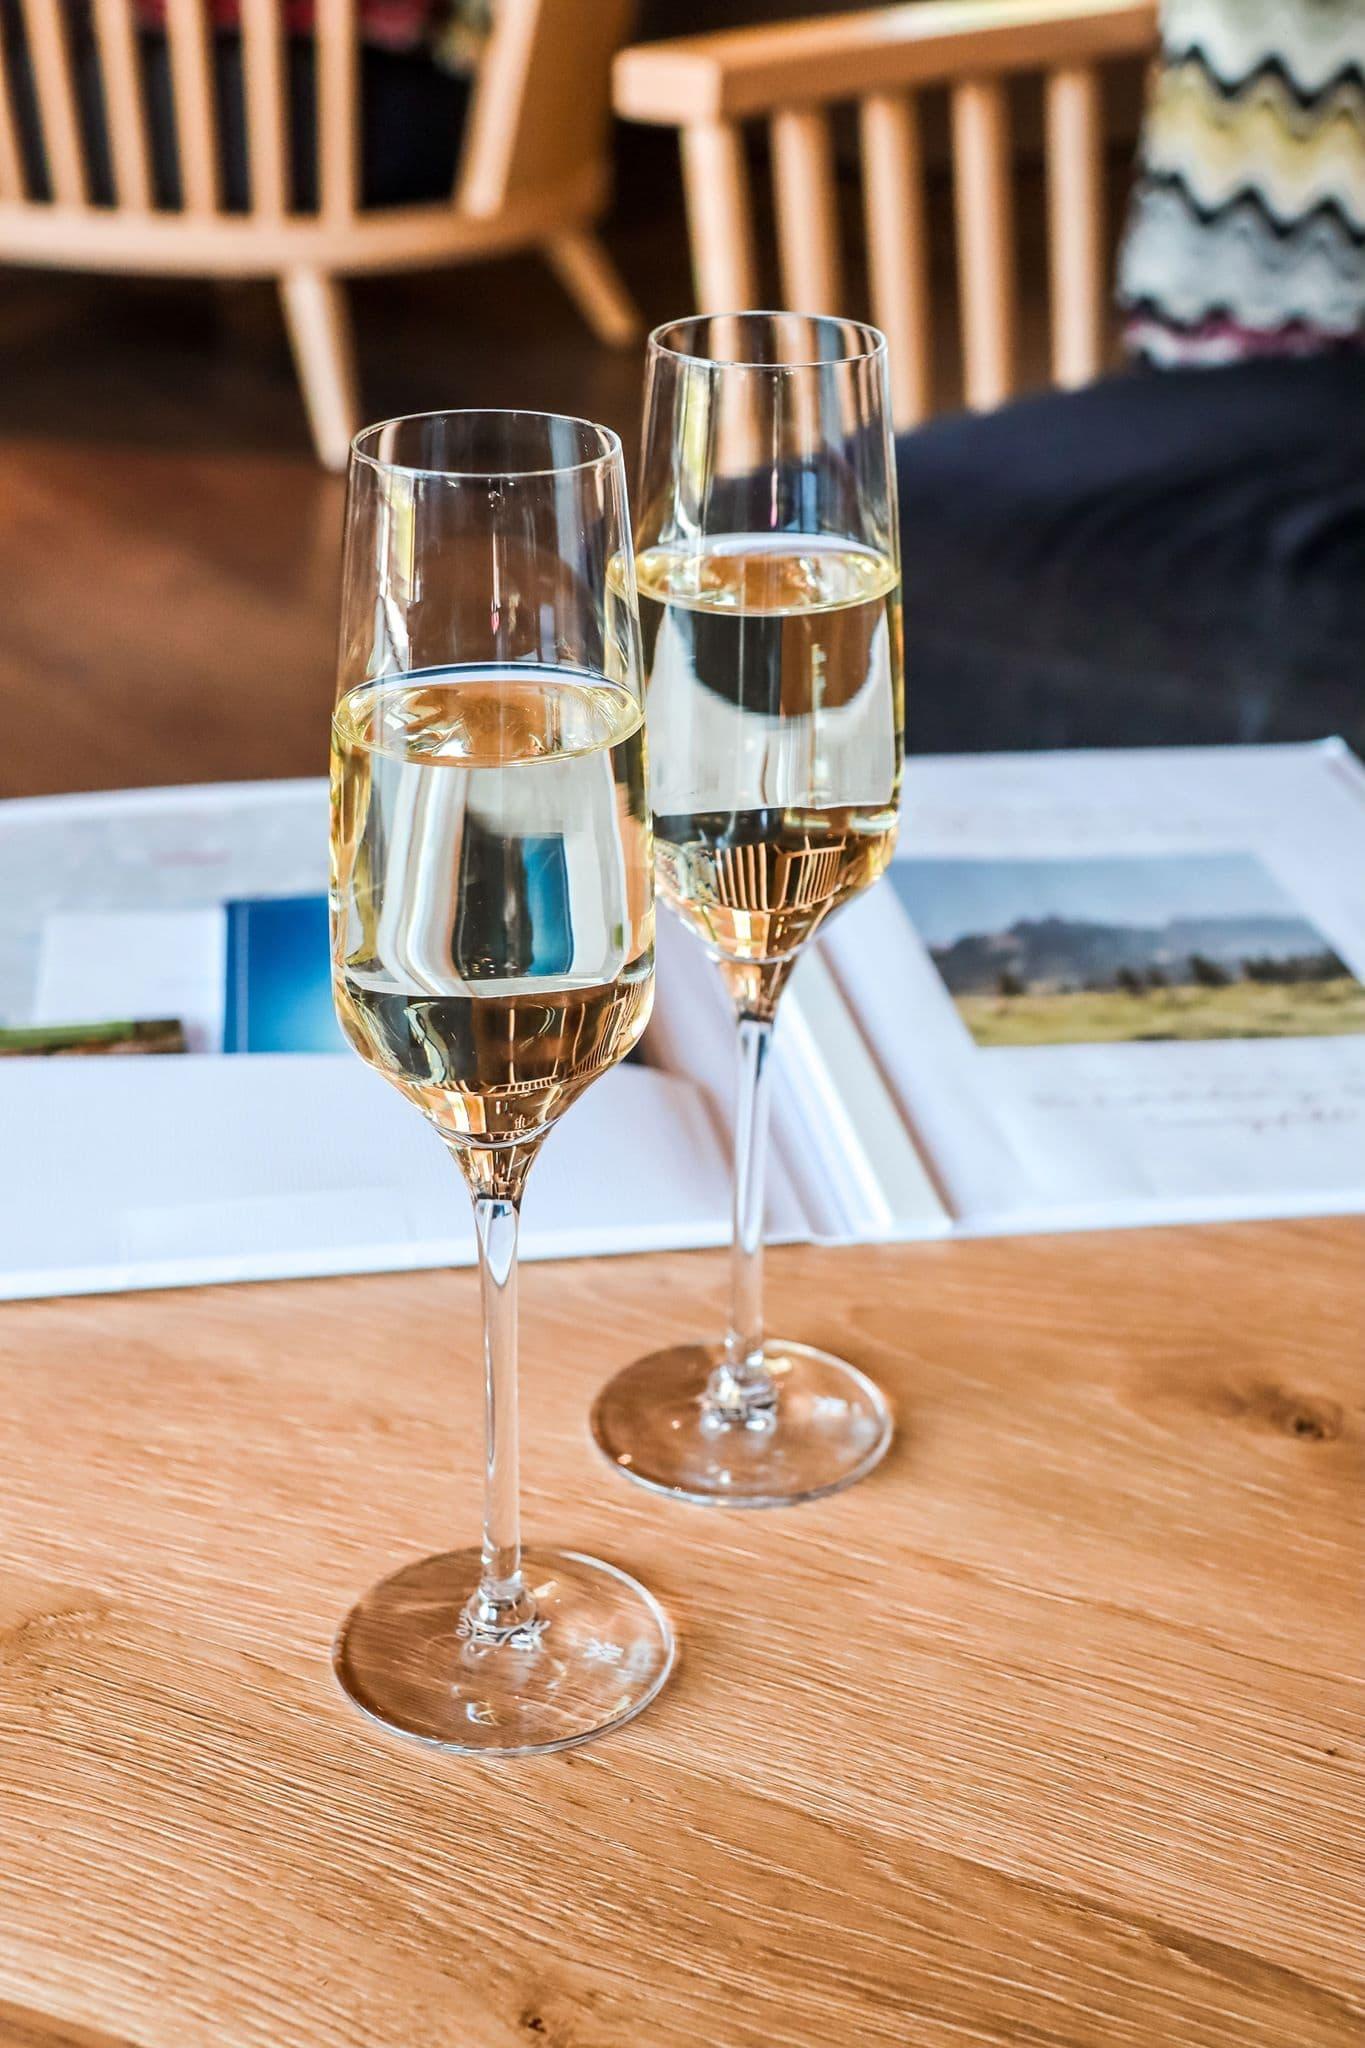 Reisen in Style - Travel Charme Bergresort Werfenweng